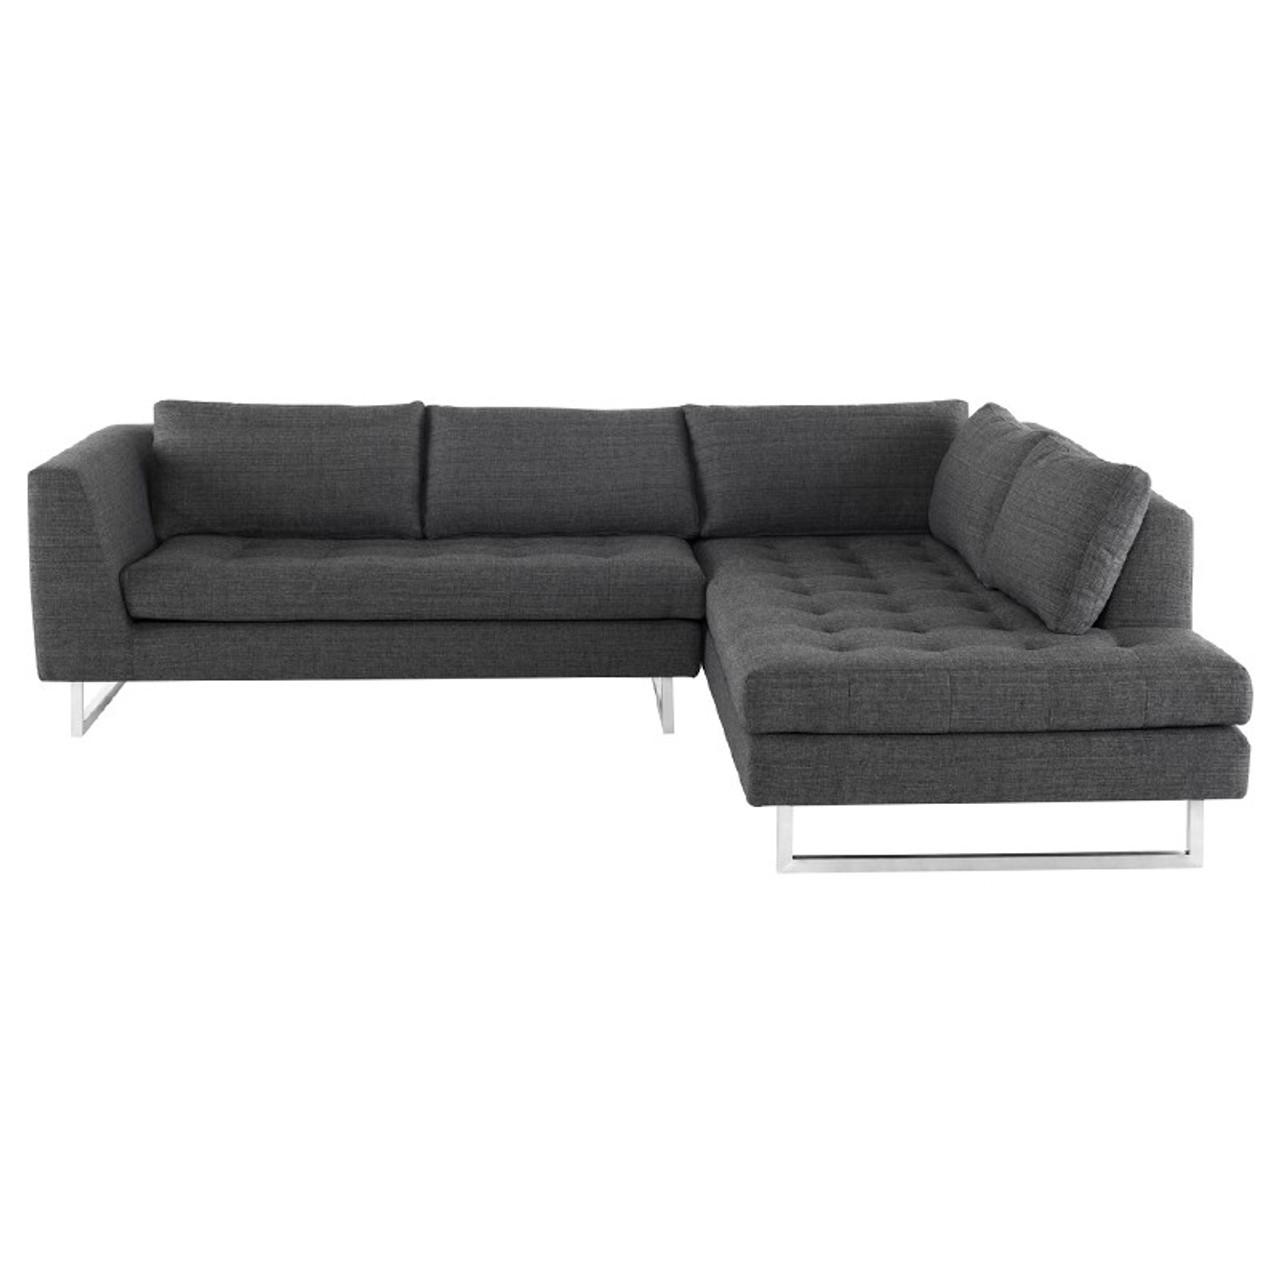 janis dark grey fabric tufted sectional sofa 105